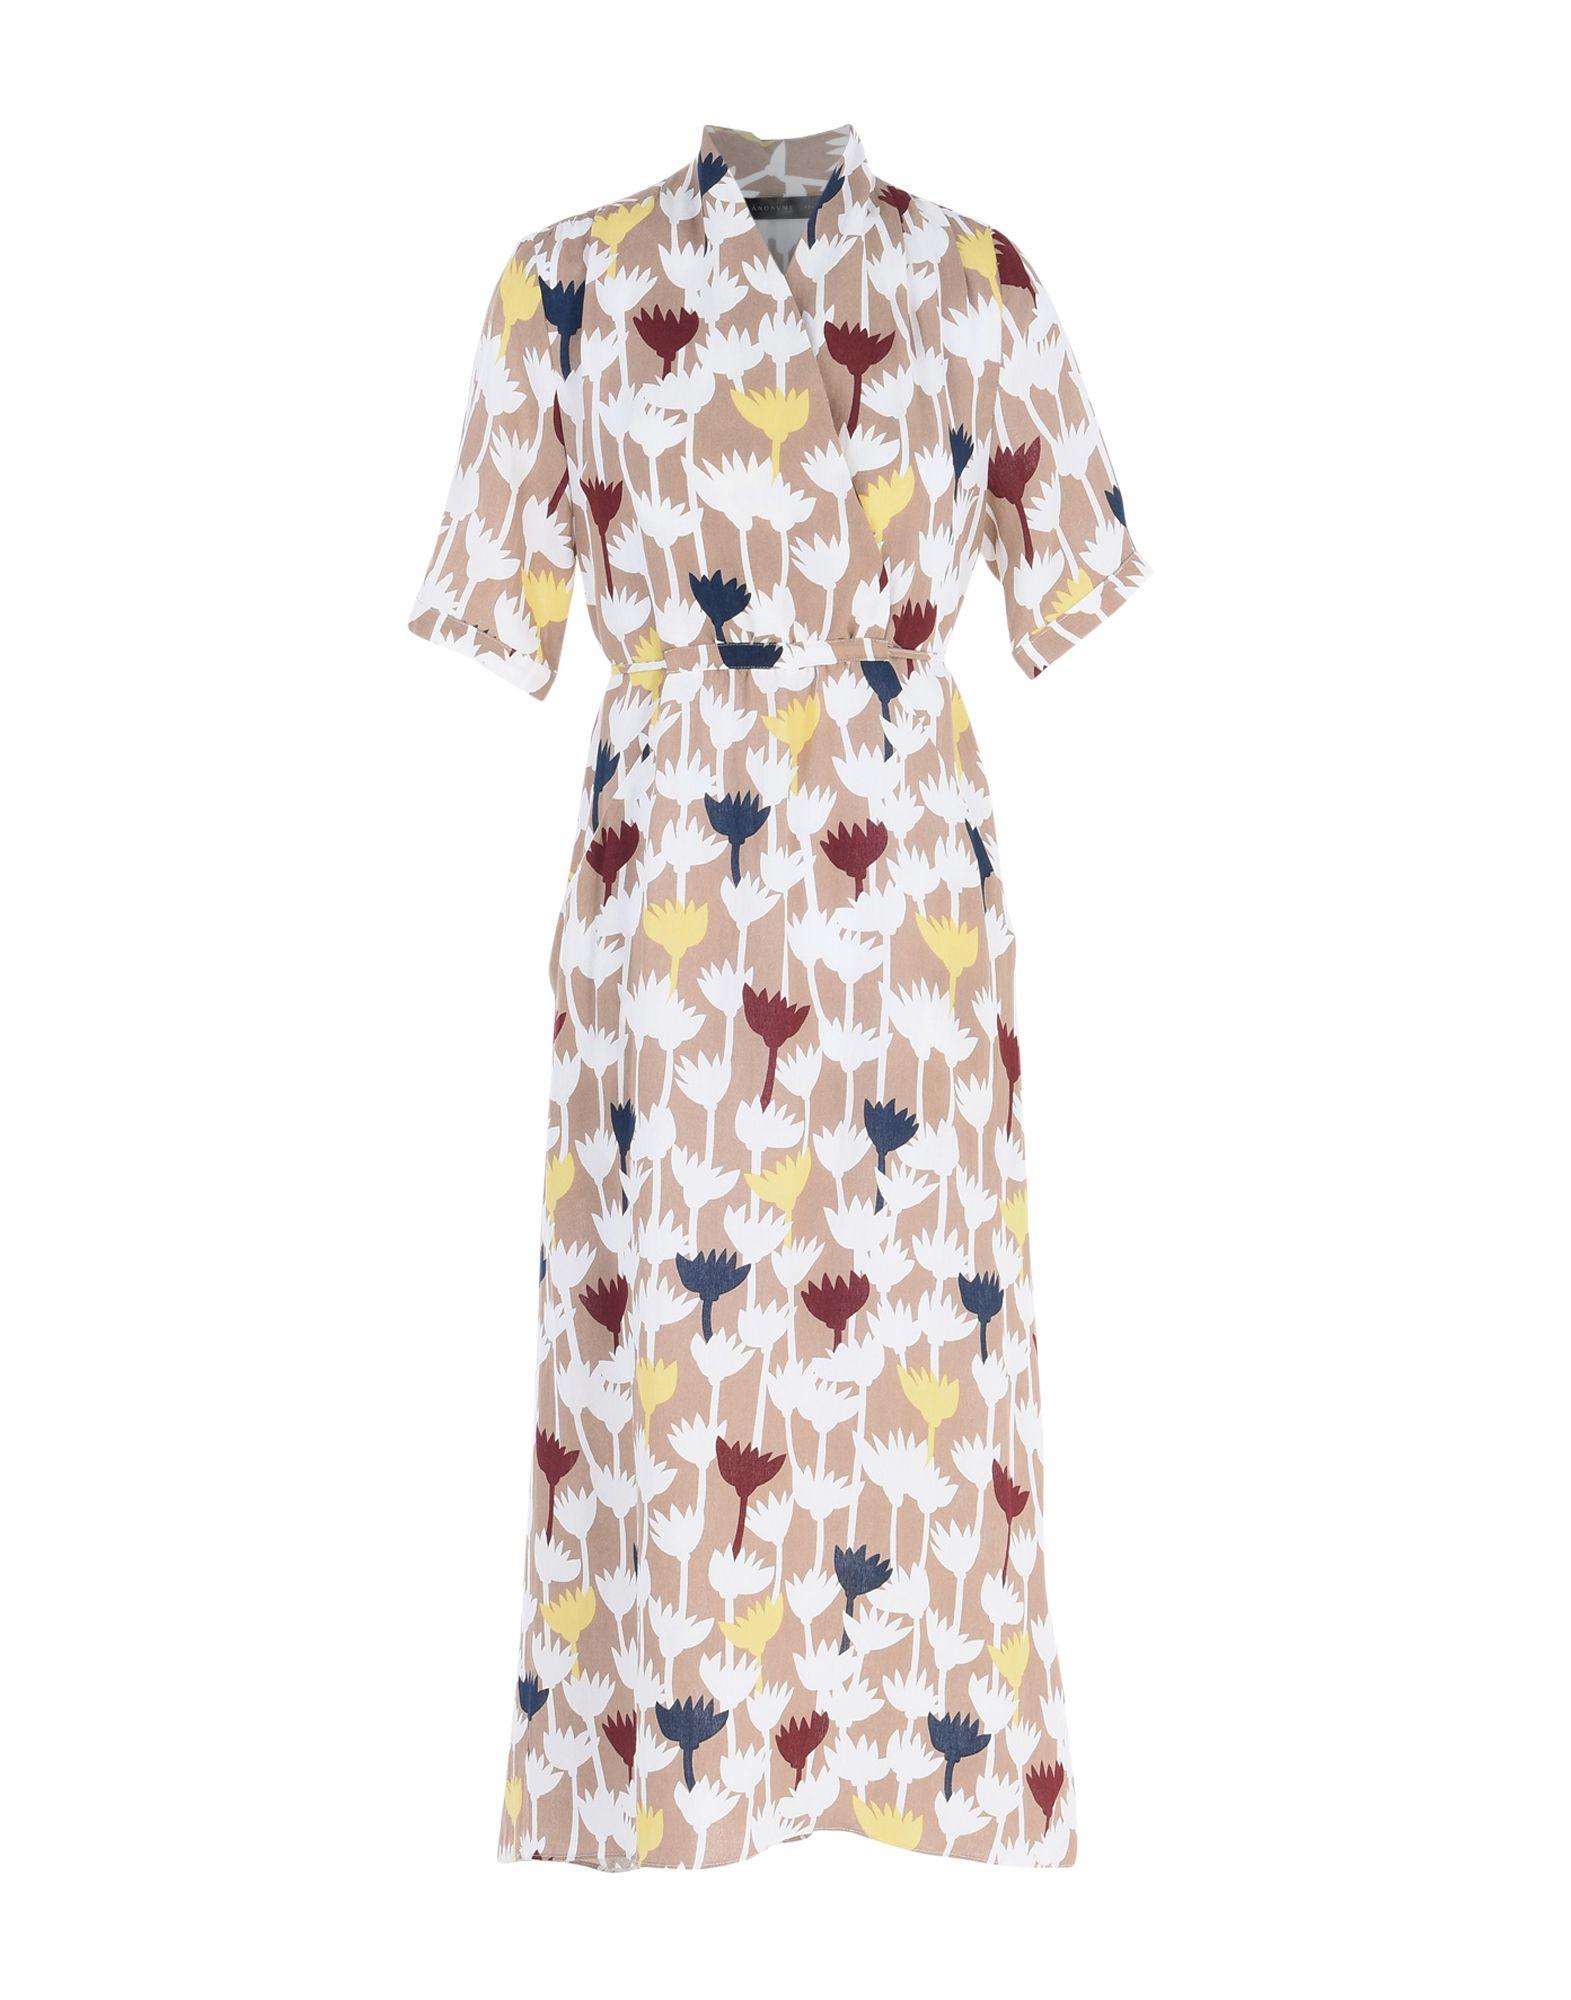 ANONYME DESIGNERS Платье длиной 3/4 lisa corti платье длиной 3 4